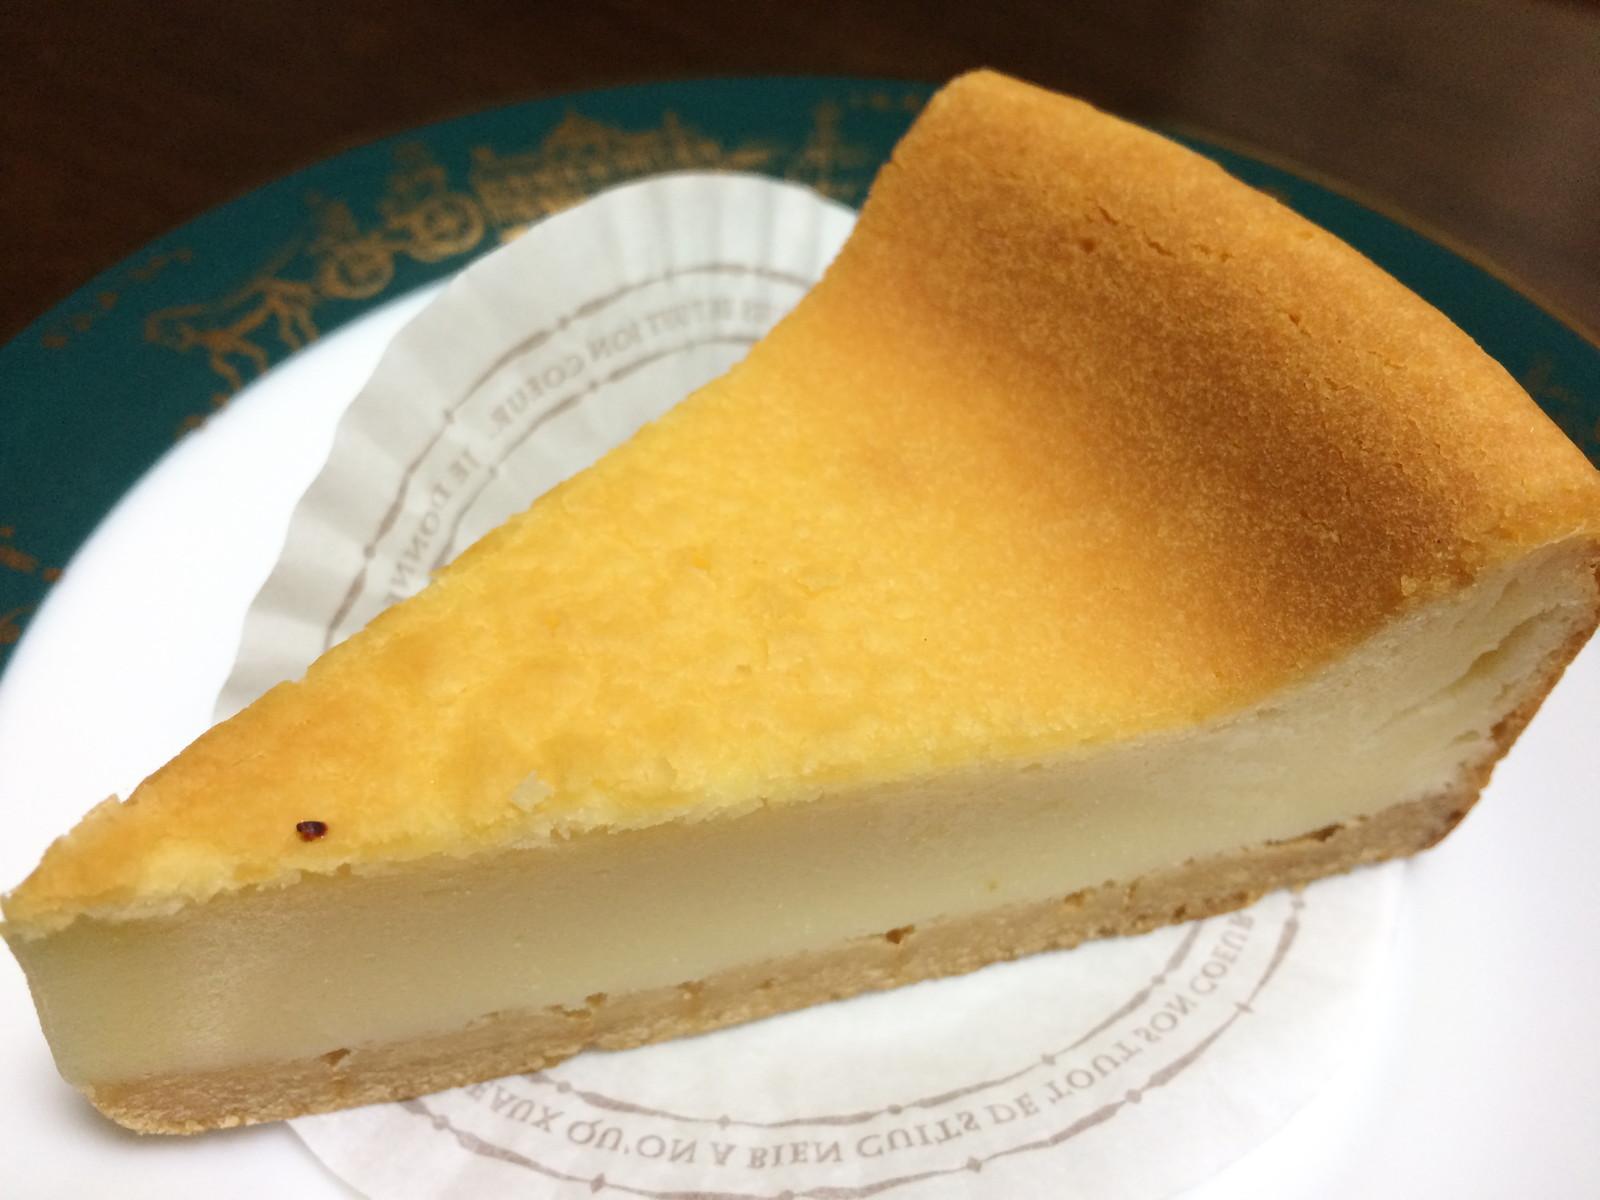 66c3f6c9693cf3 マンボな毎日:チーズケーキ